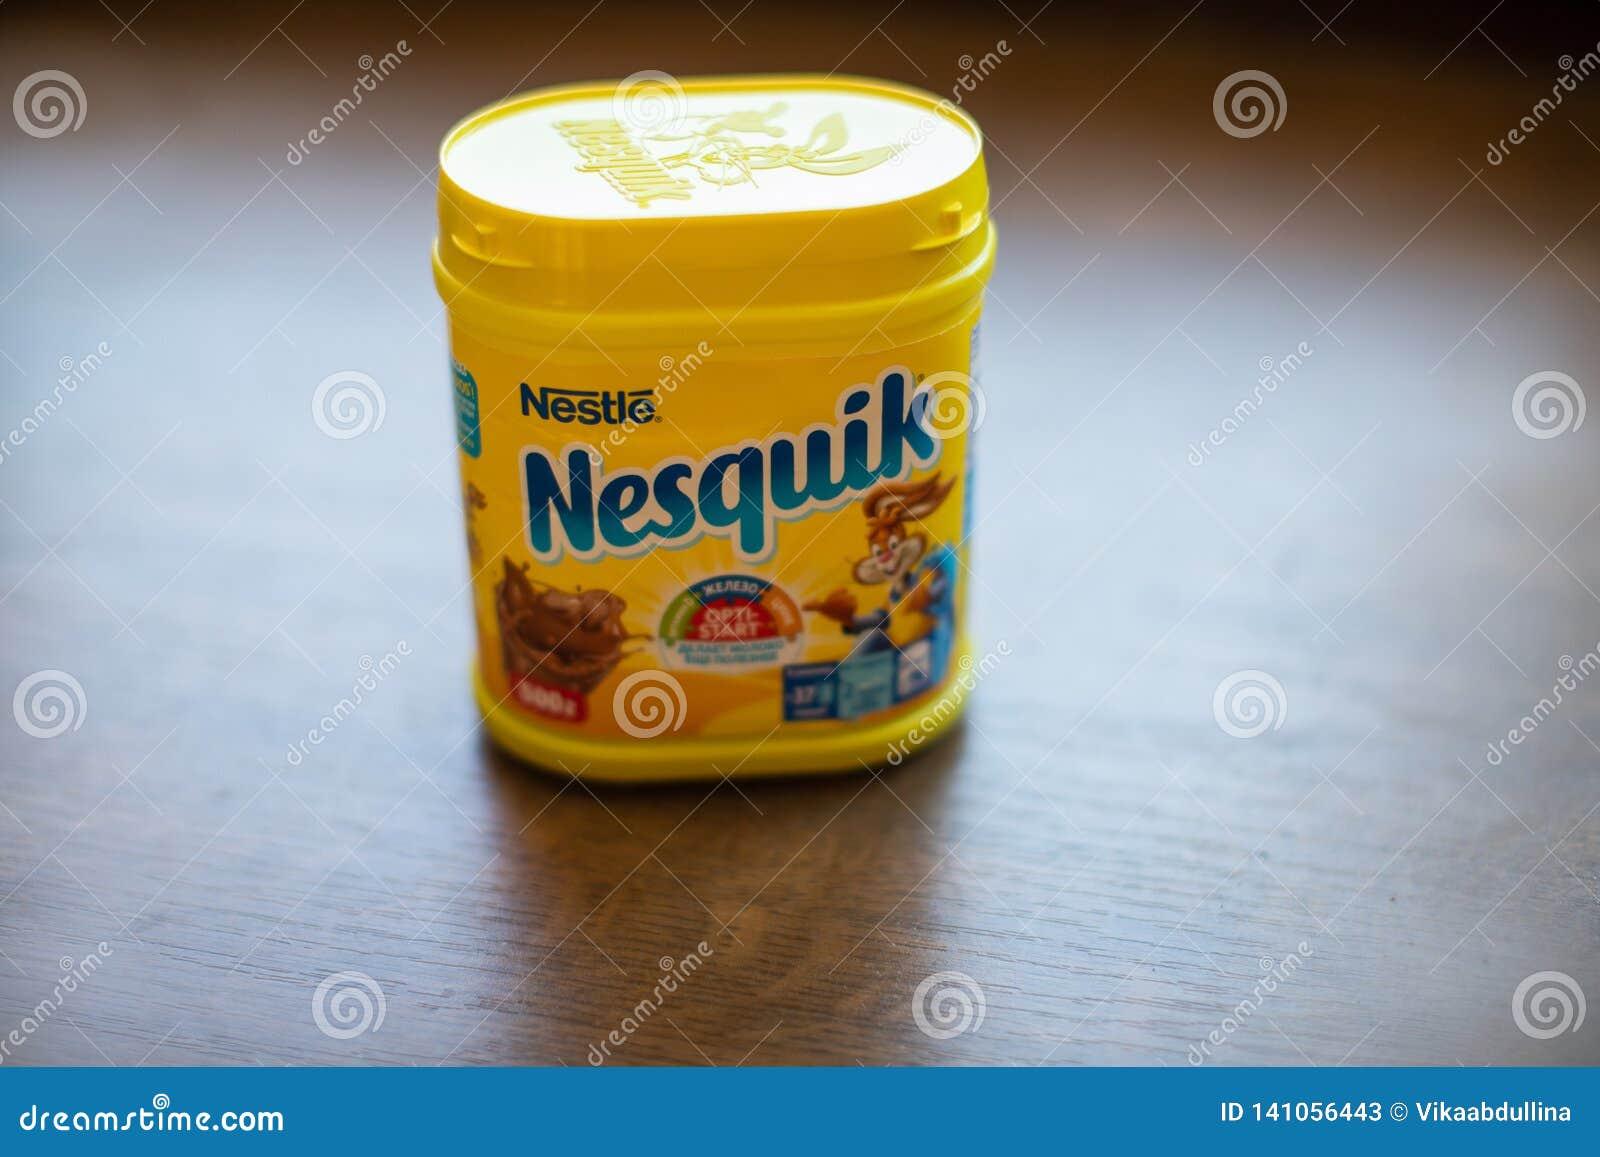 Packe av choklad- och kakaodrinken Nesquik vid Nestle på träbakgrund